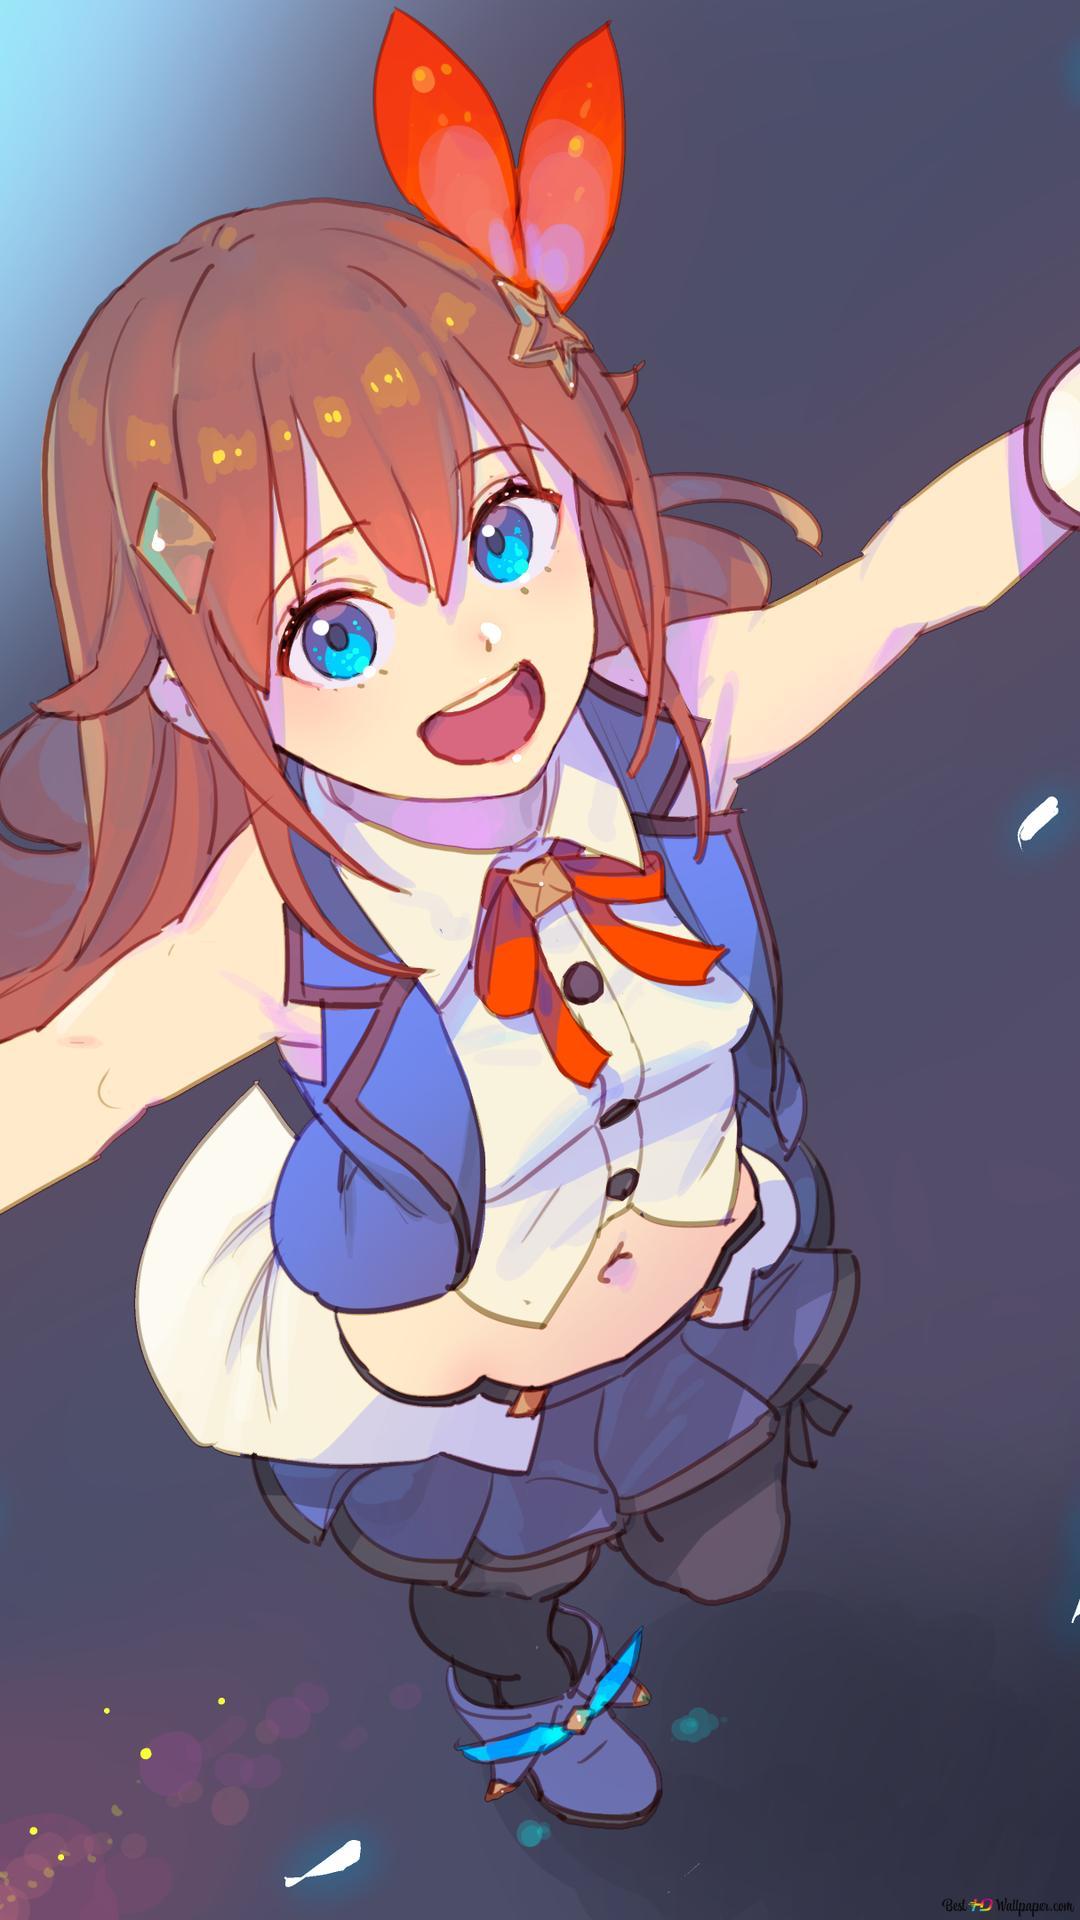 Sora Tokino De Youtuber Virtuel Hd Fond D Ecran Telecharger